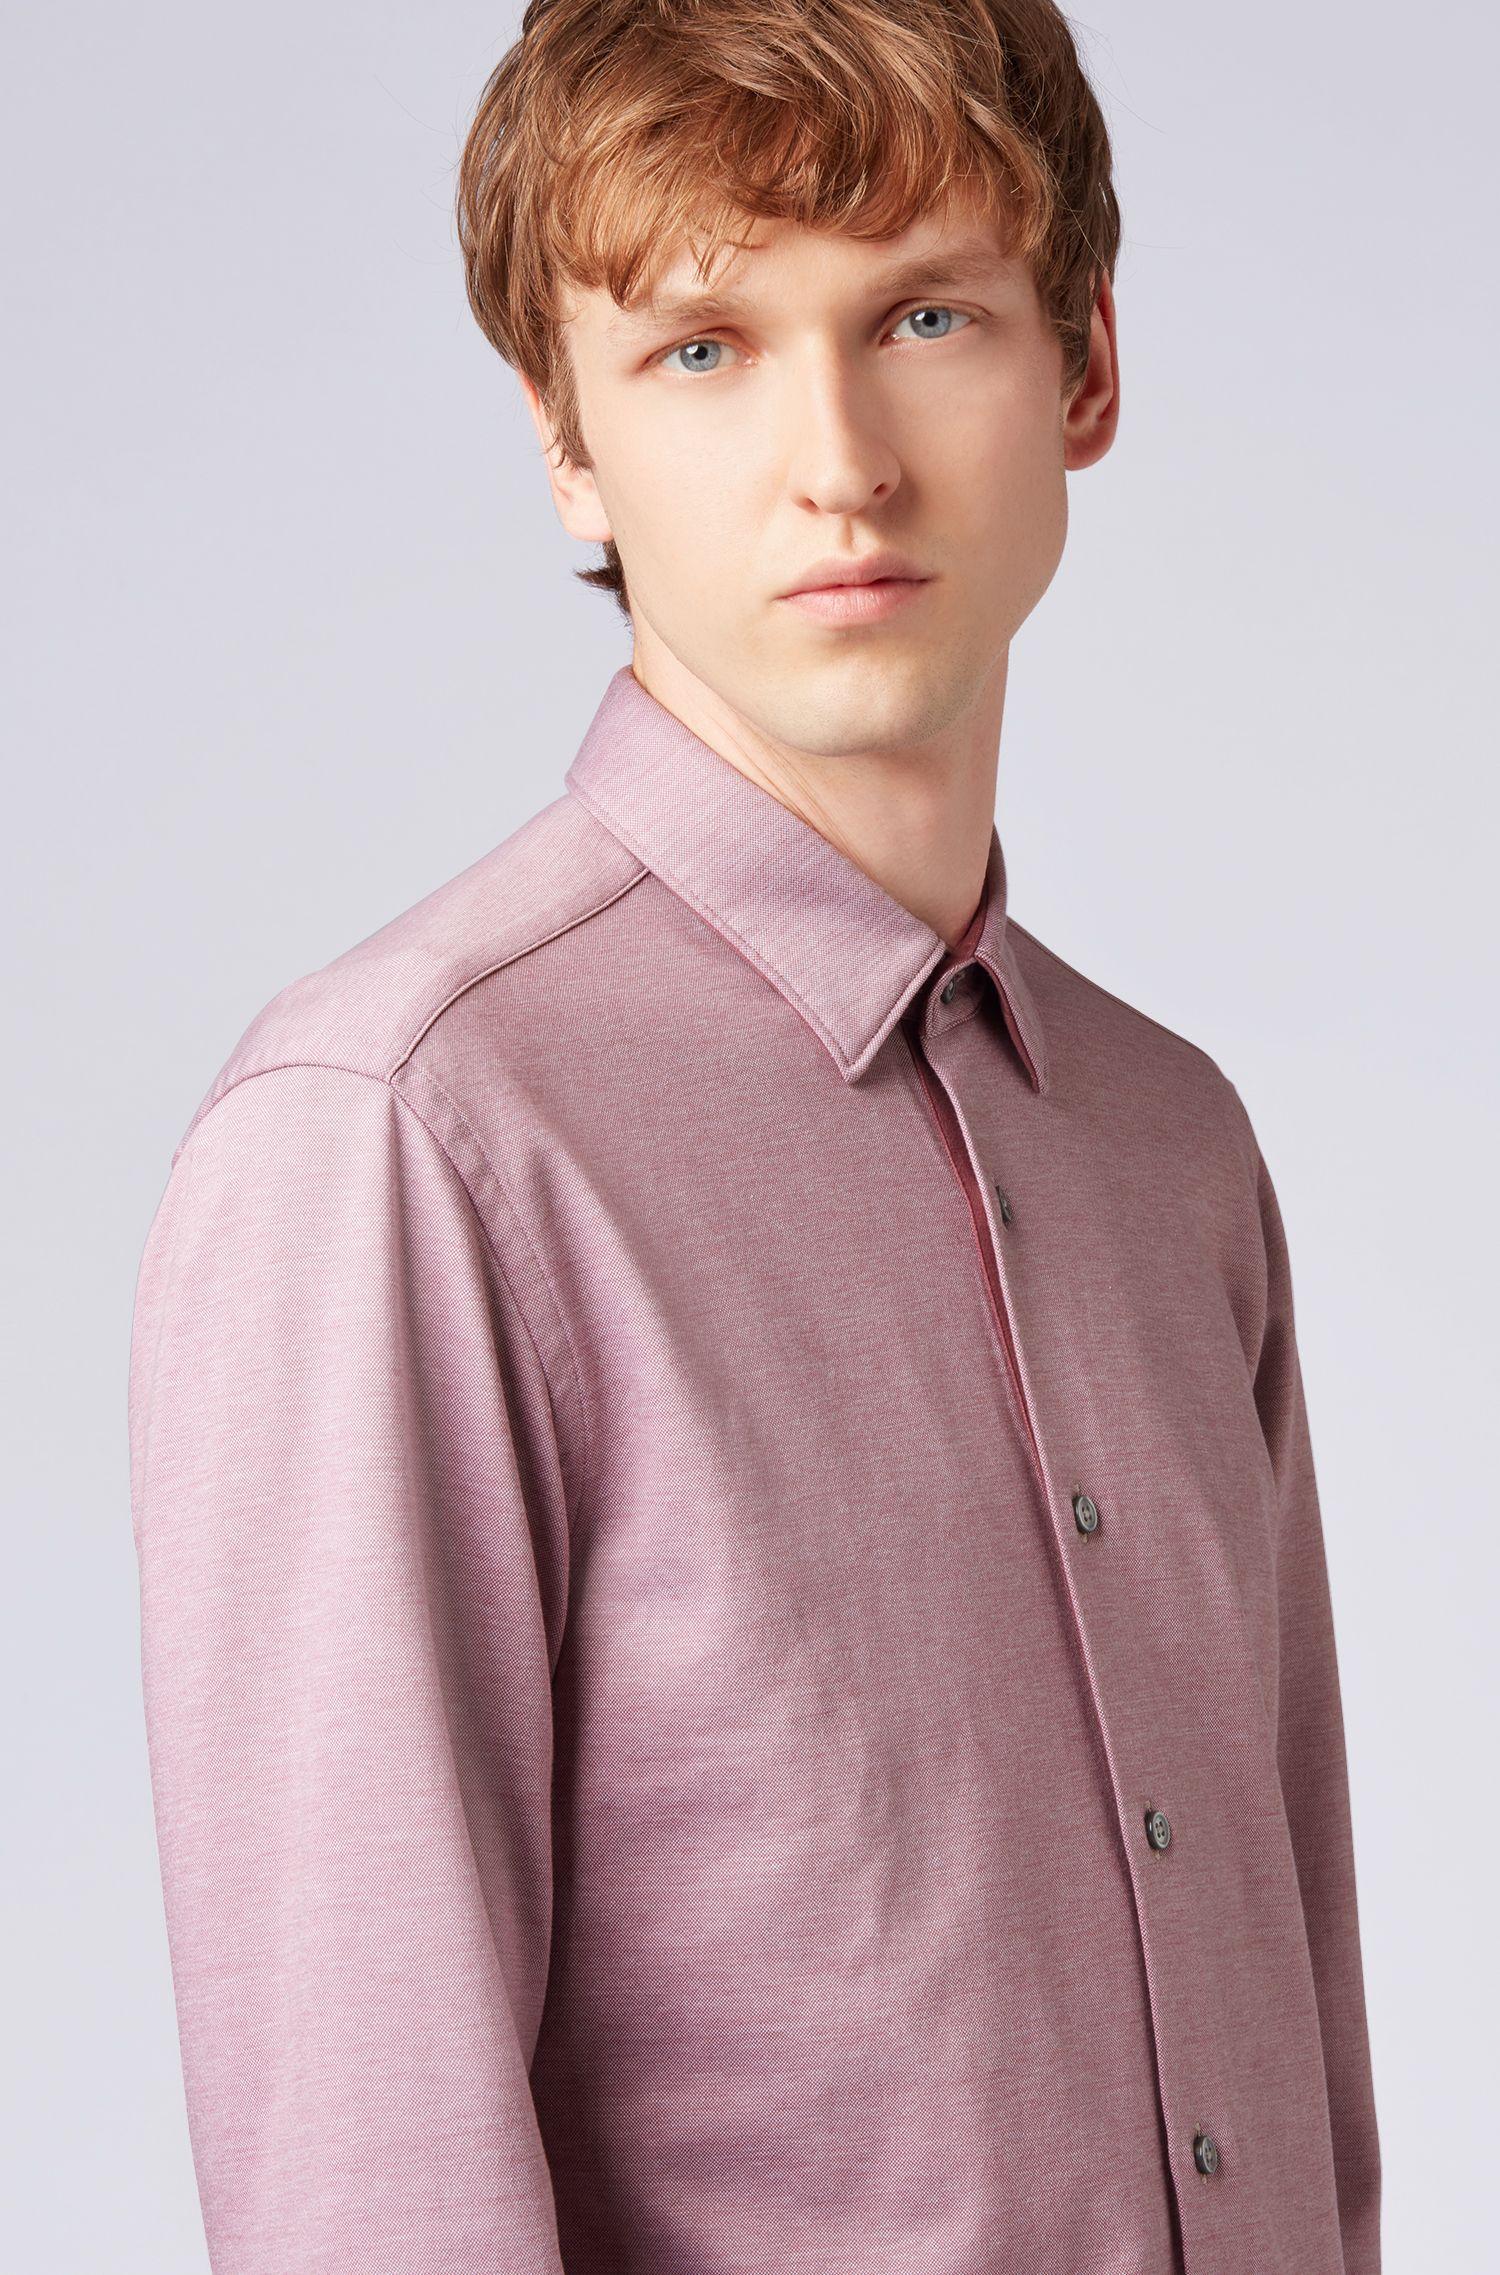 Slim-fit shirt in double-faced cotton-jersey piqué, Open Purple